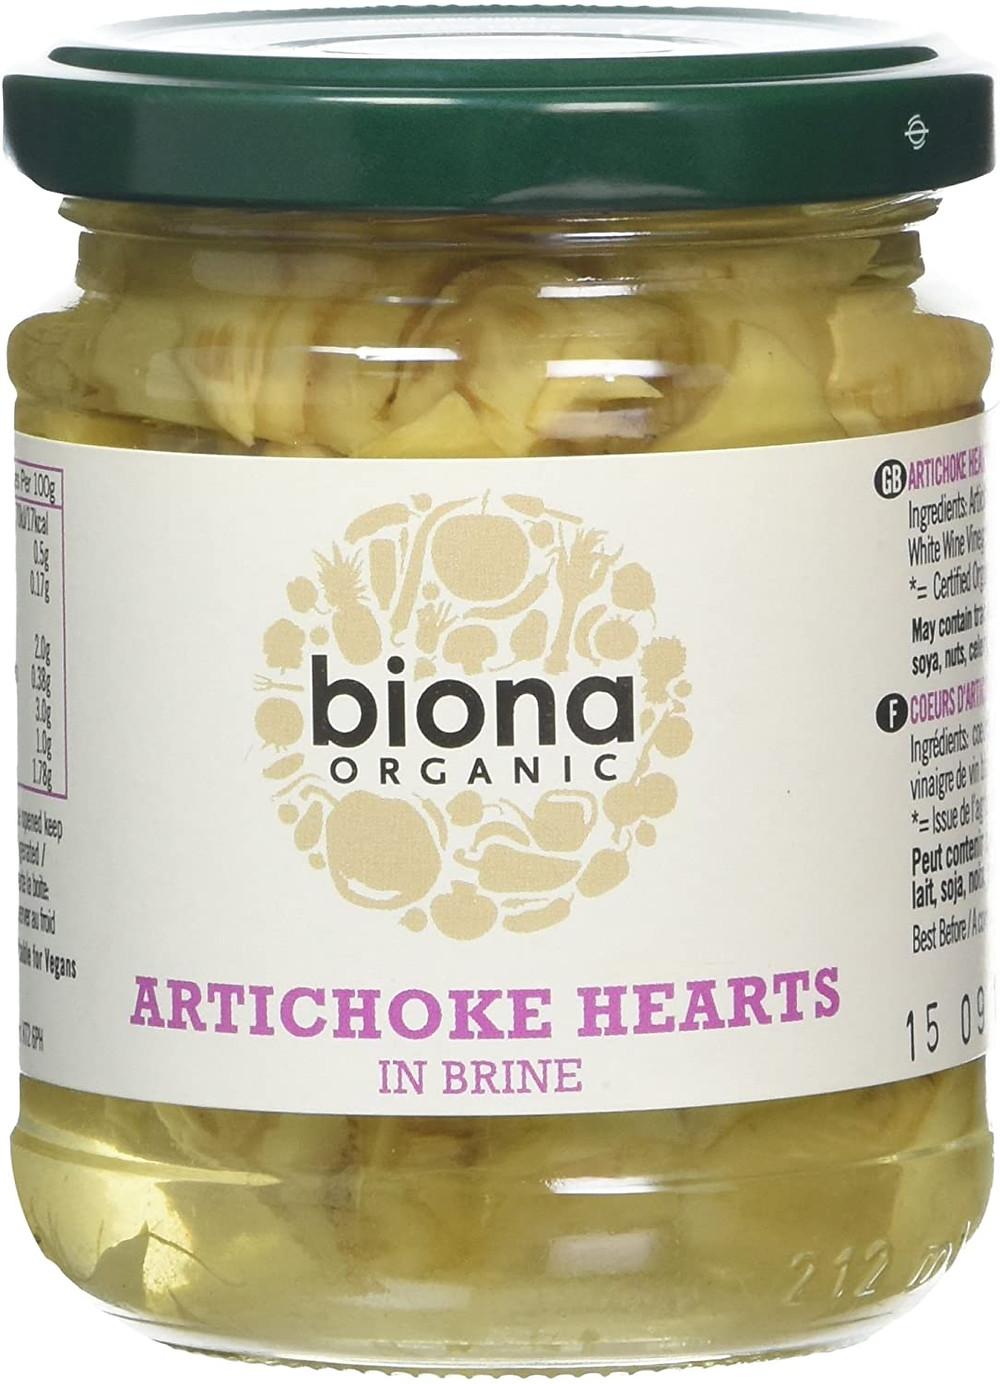 Biona Organic Artichoke Hearts